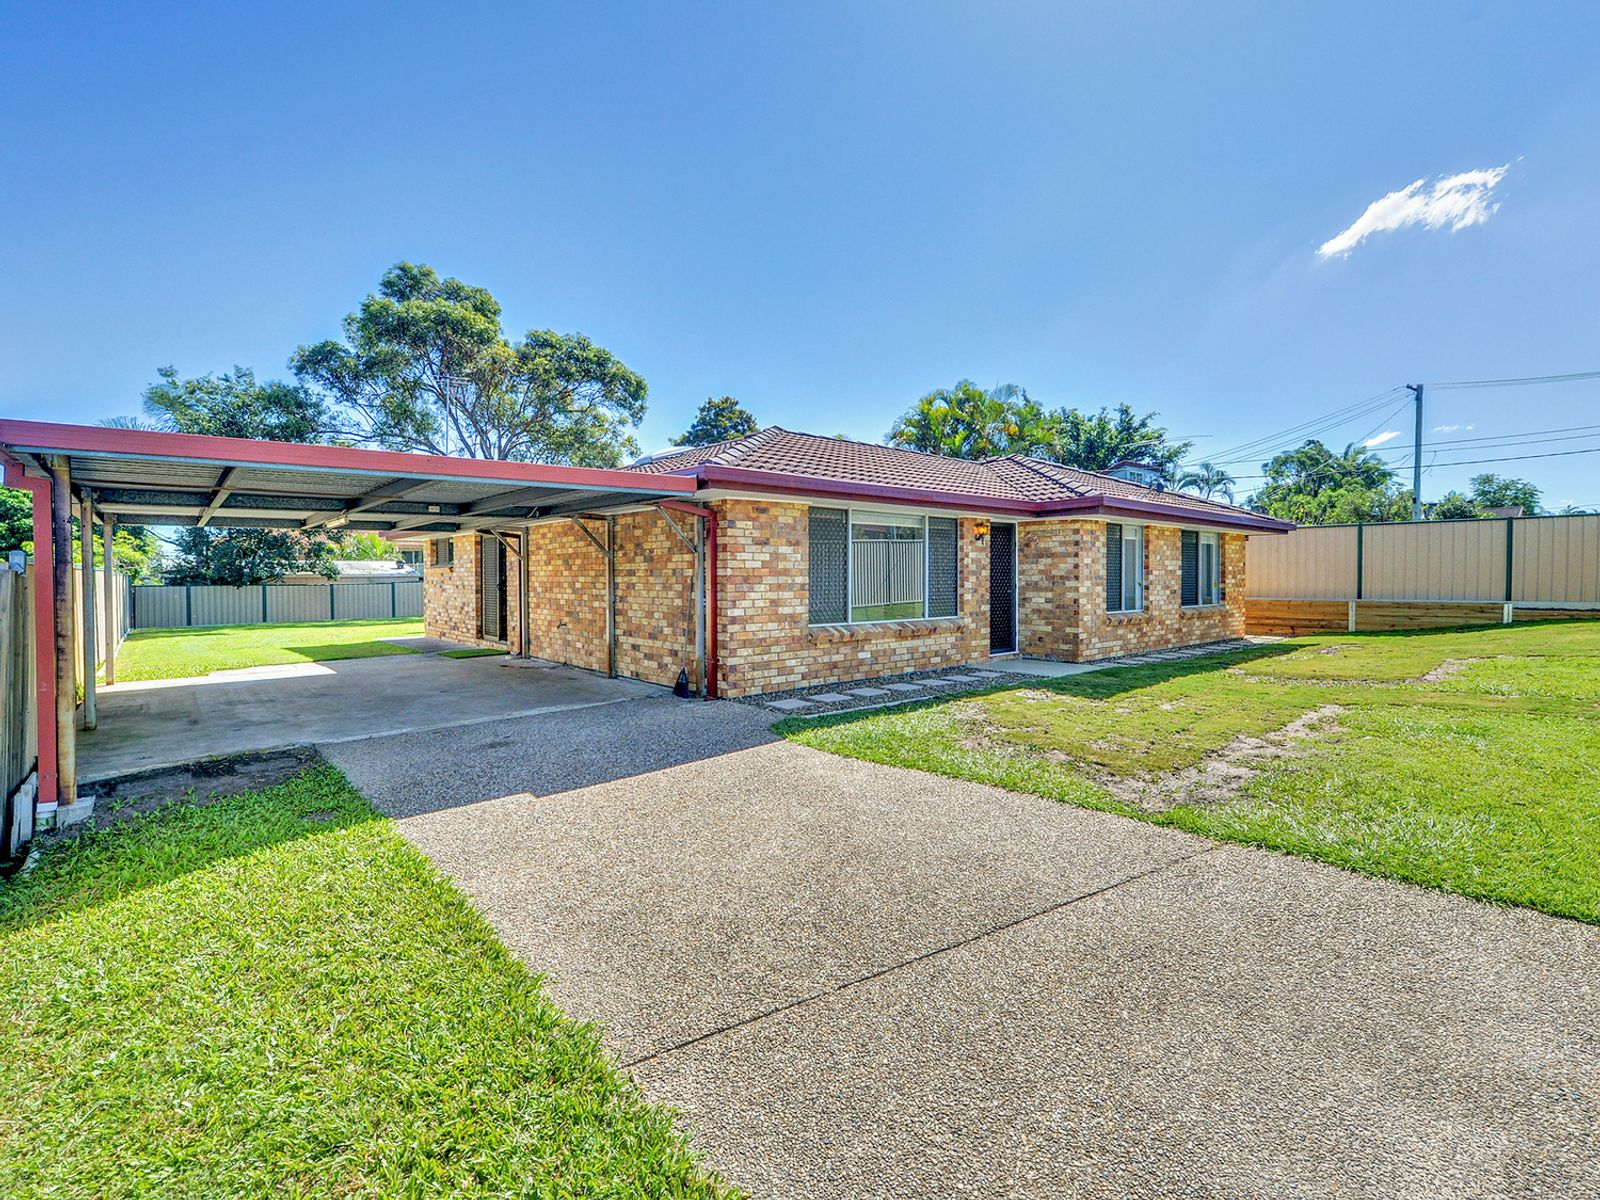 24 Furzer Street, Browns Plains, QLD 4118